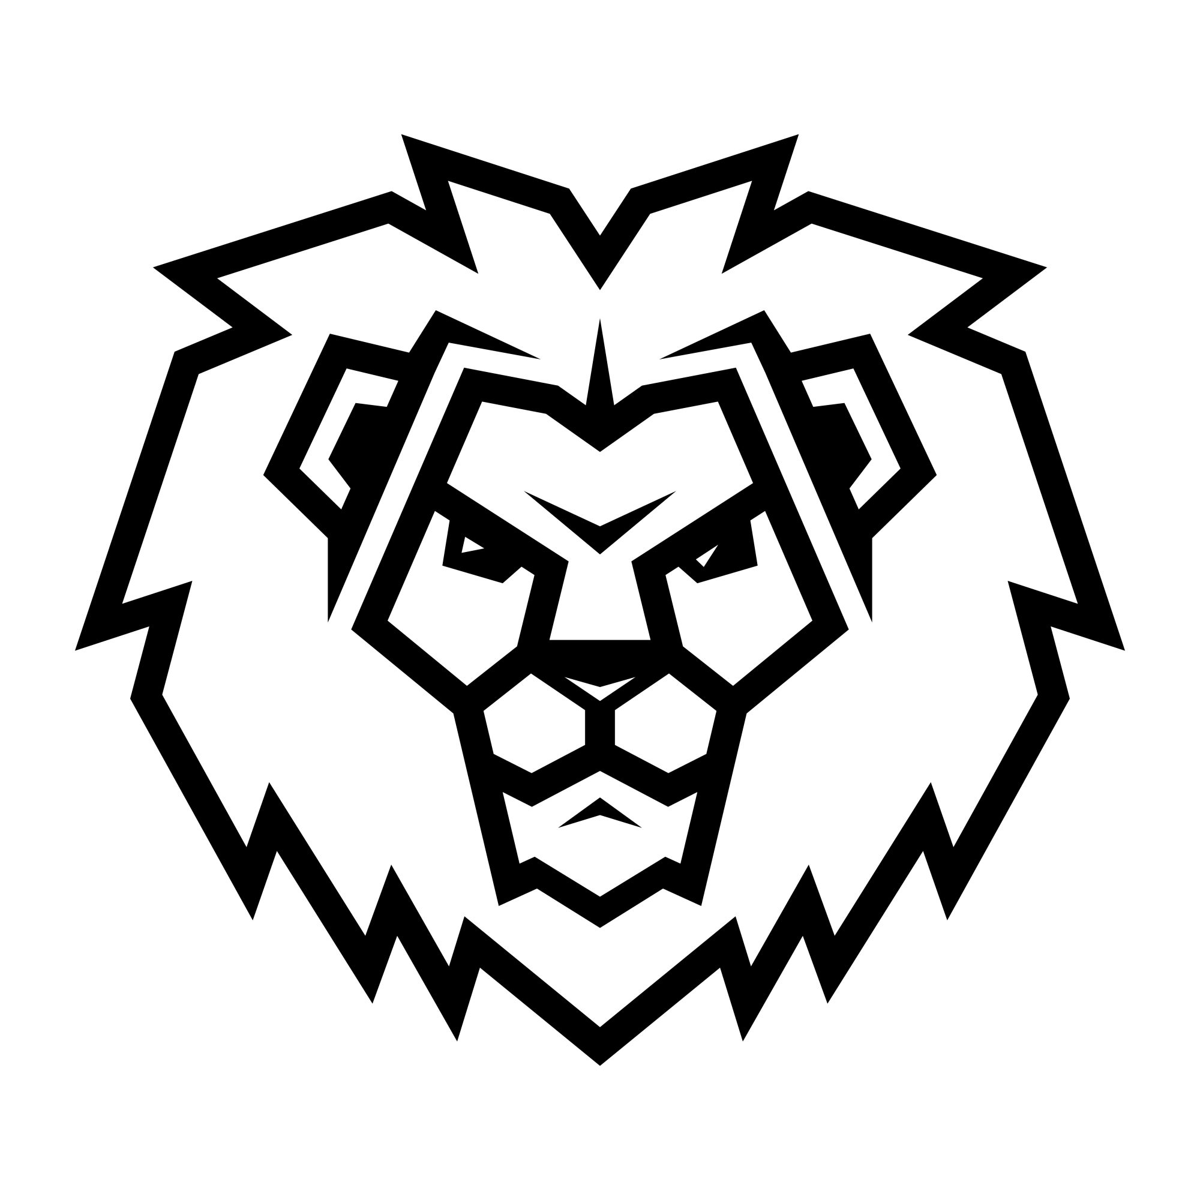 Lion head cartoon illustration